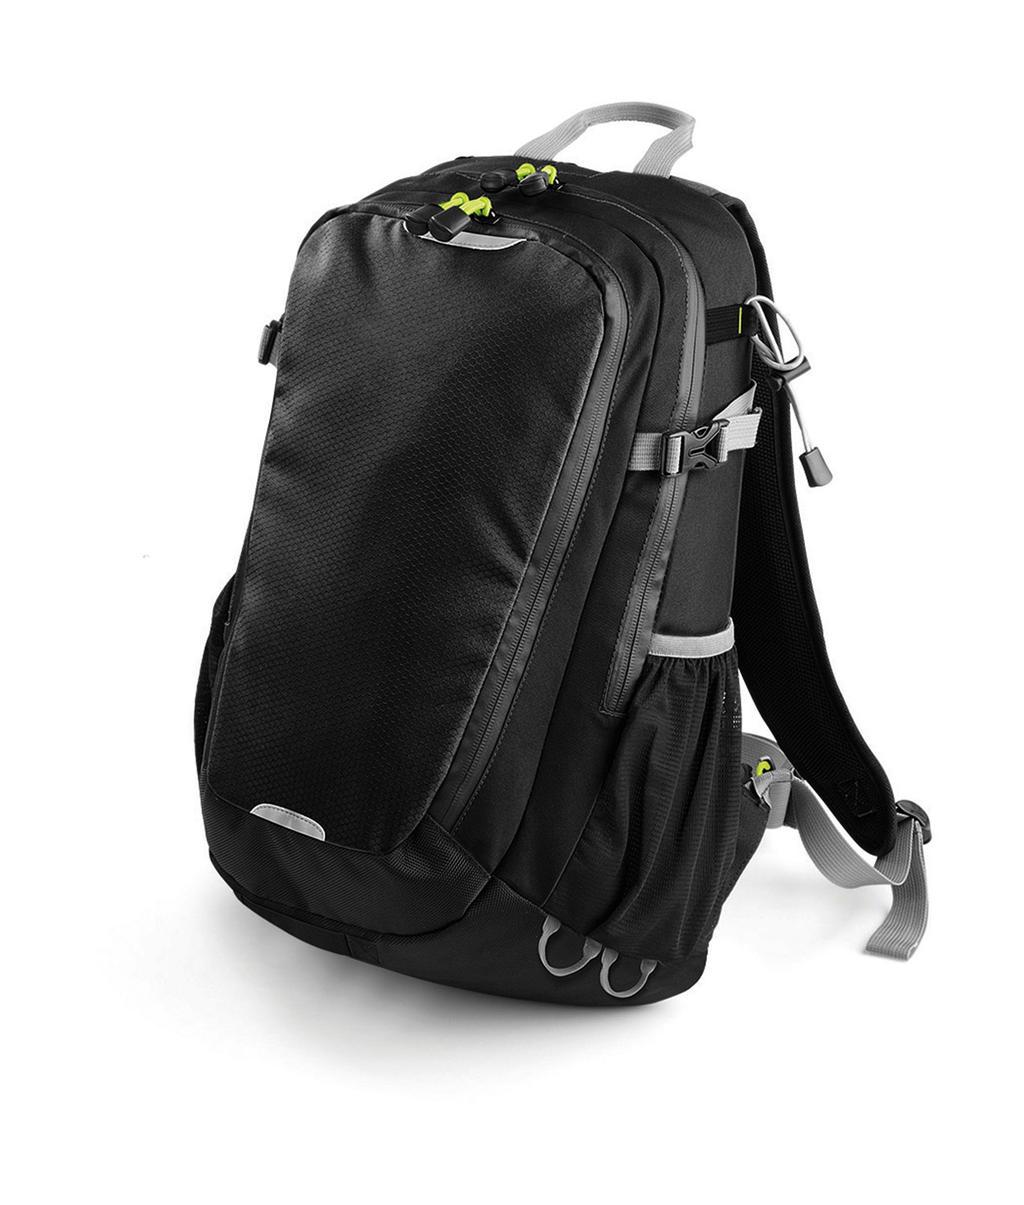 Batoh SLX 20 Litre Daypack - zvìtšit obrázek